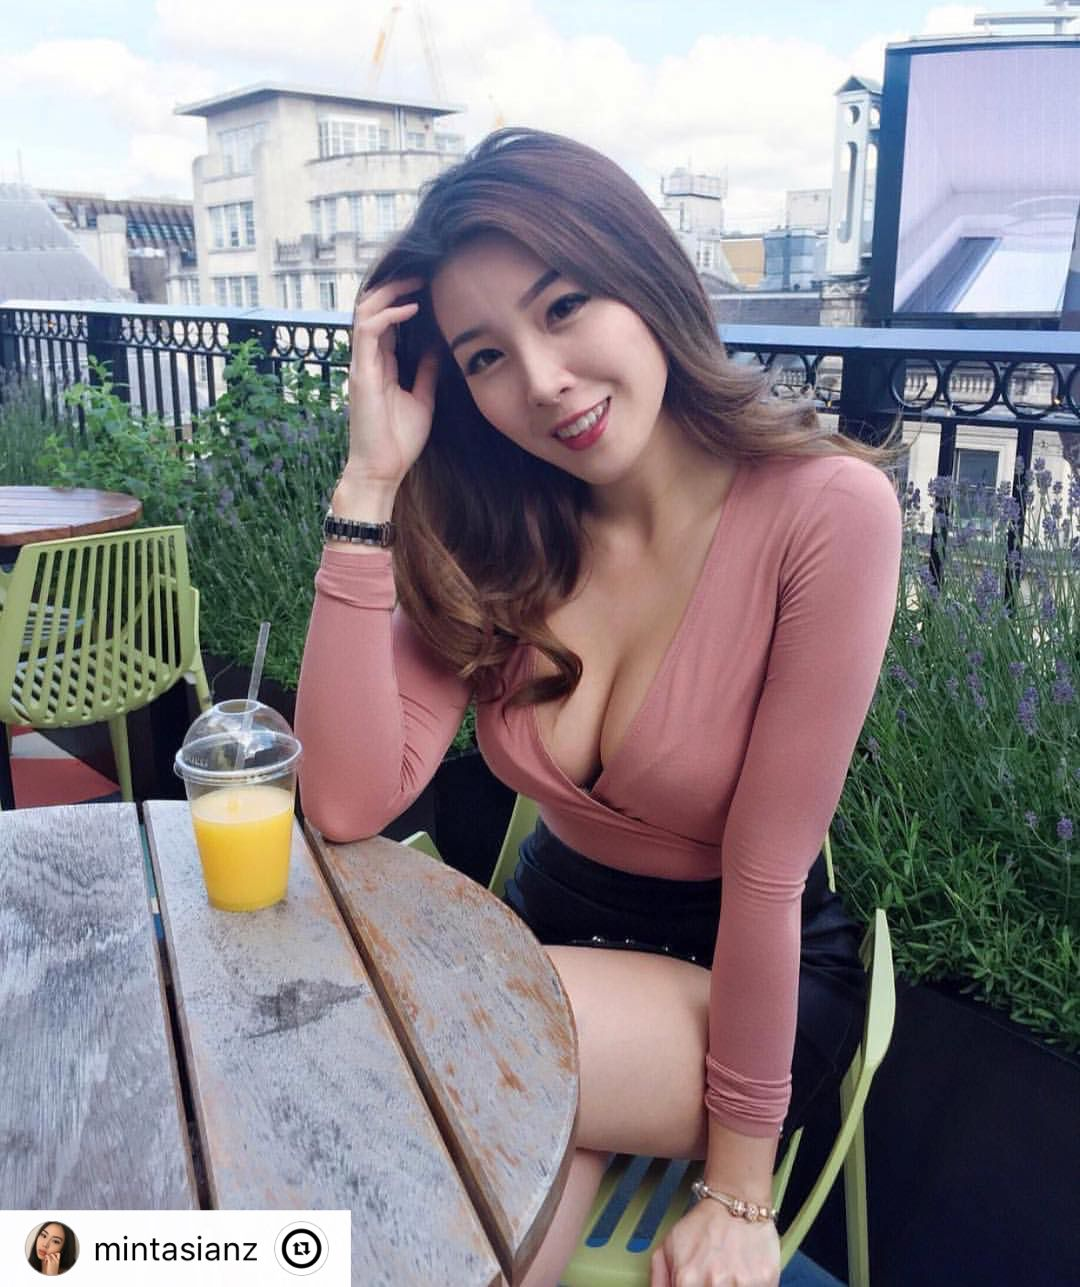 pingary spaulding on asian women | pinterest | asian, models and